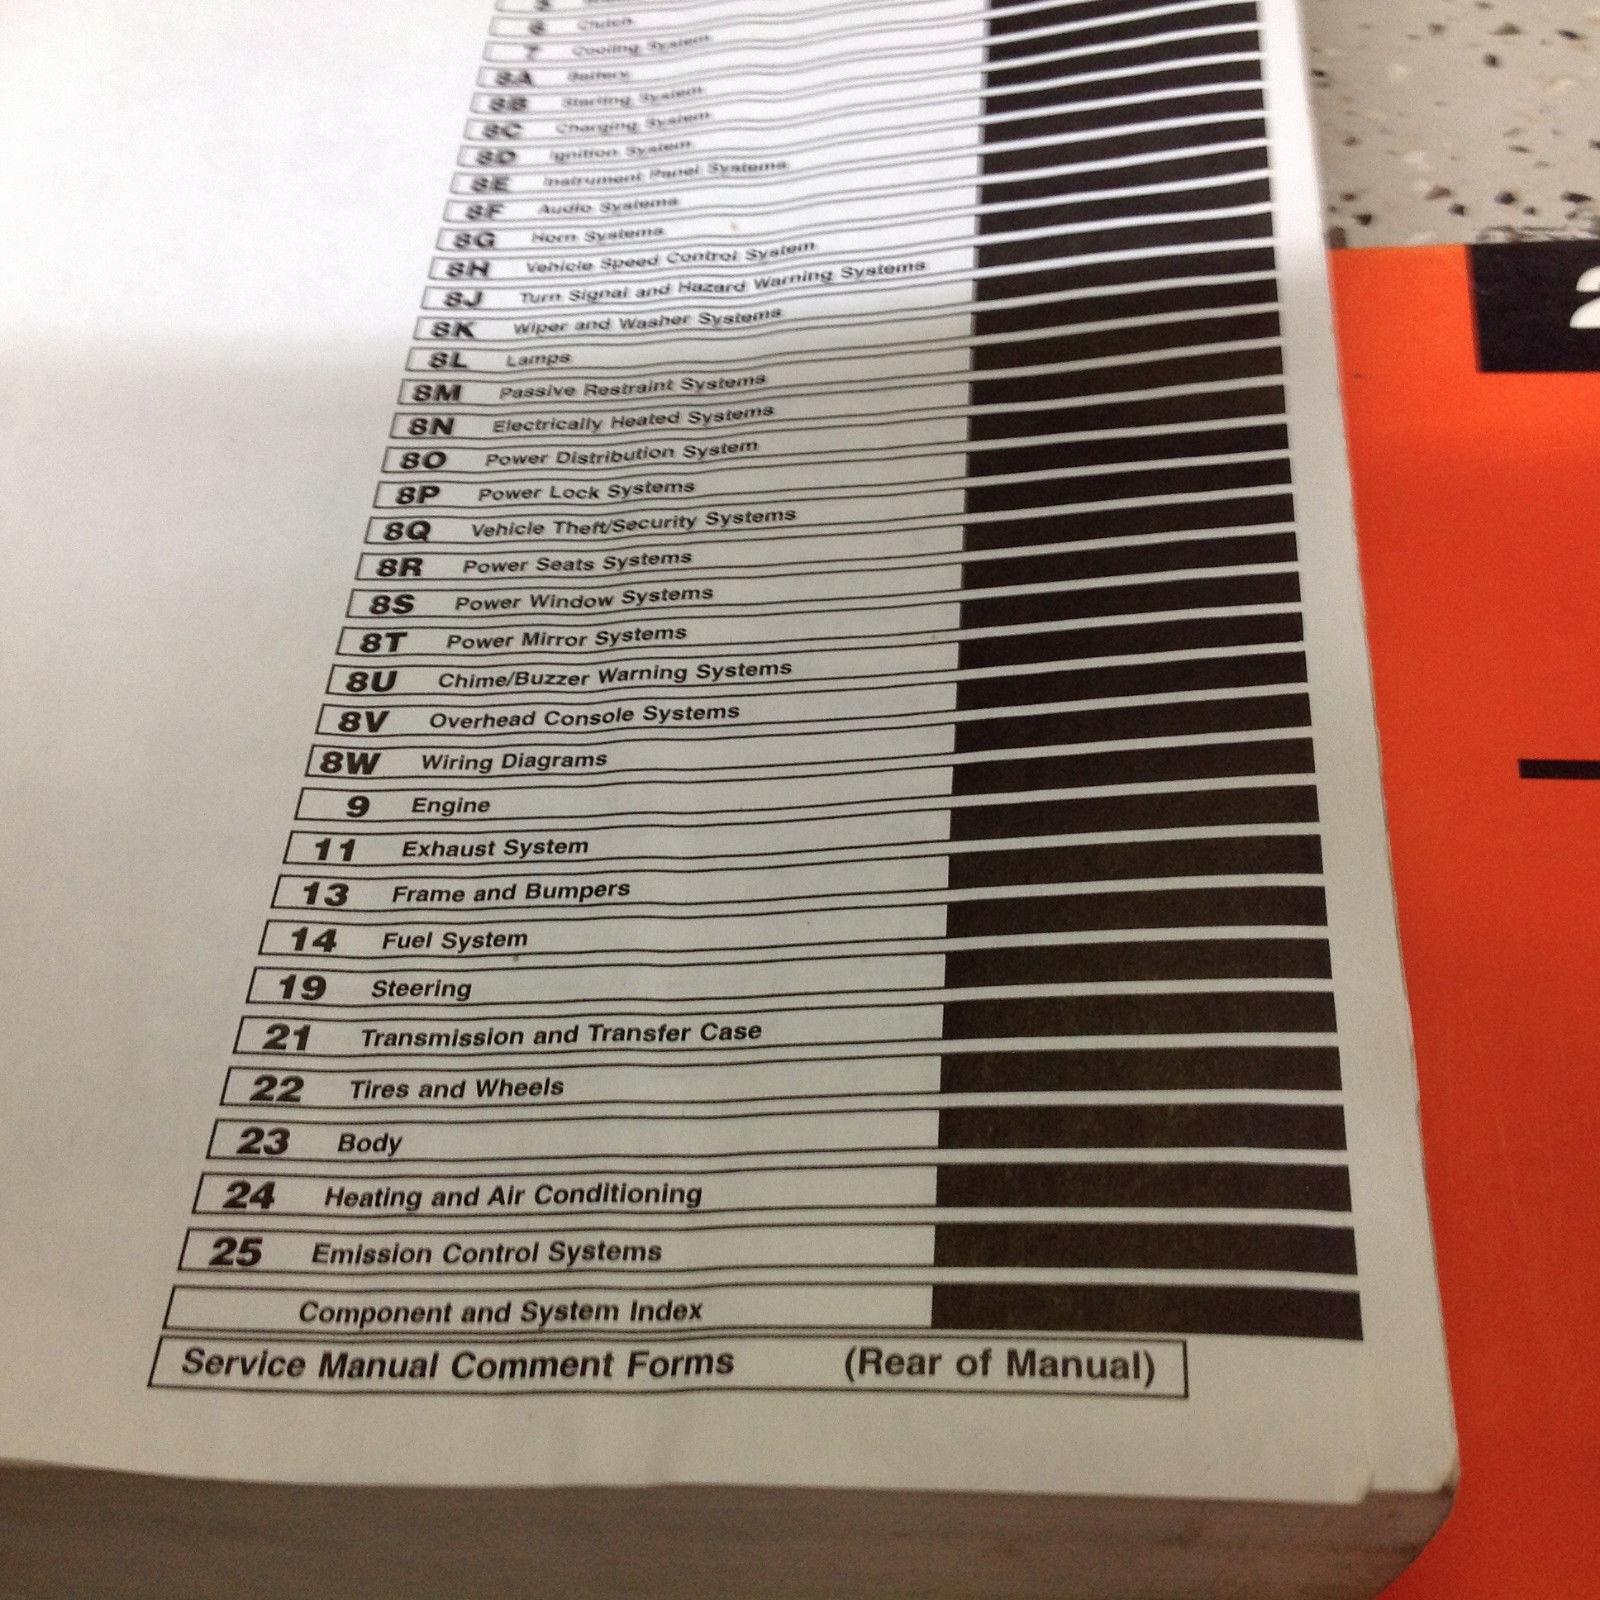 ... 2000 JEEP CHEROKEE Service Repair Shop Manual Set W Chassis Diagnostic  Book OEM ...